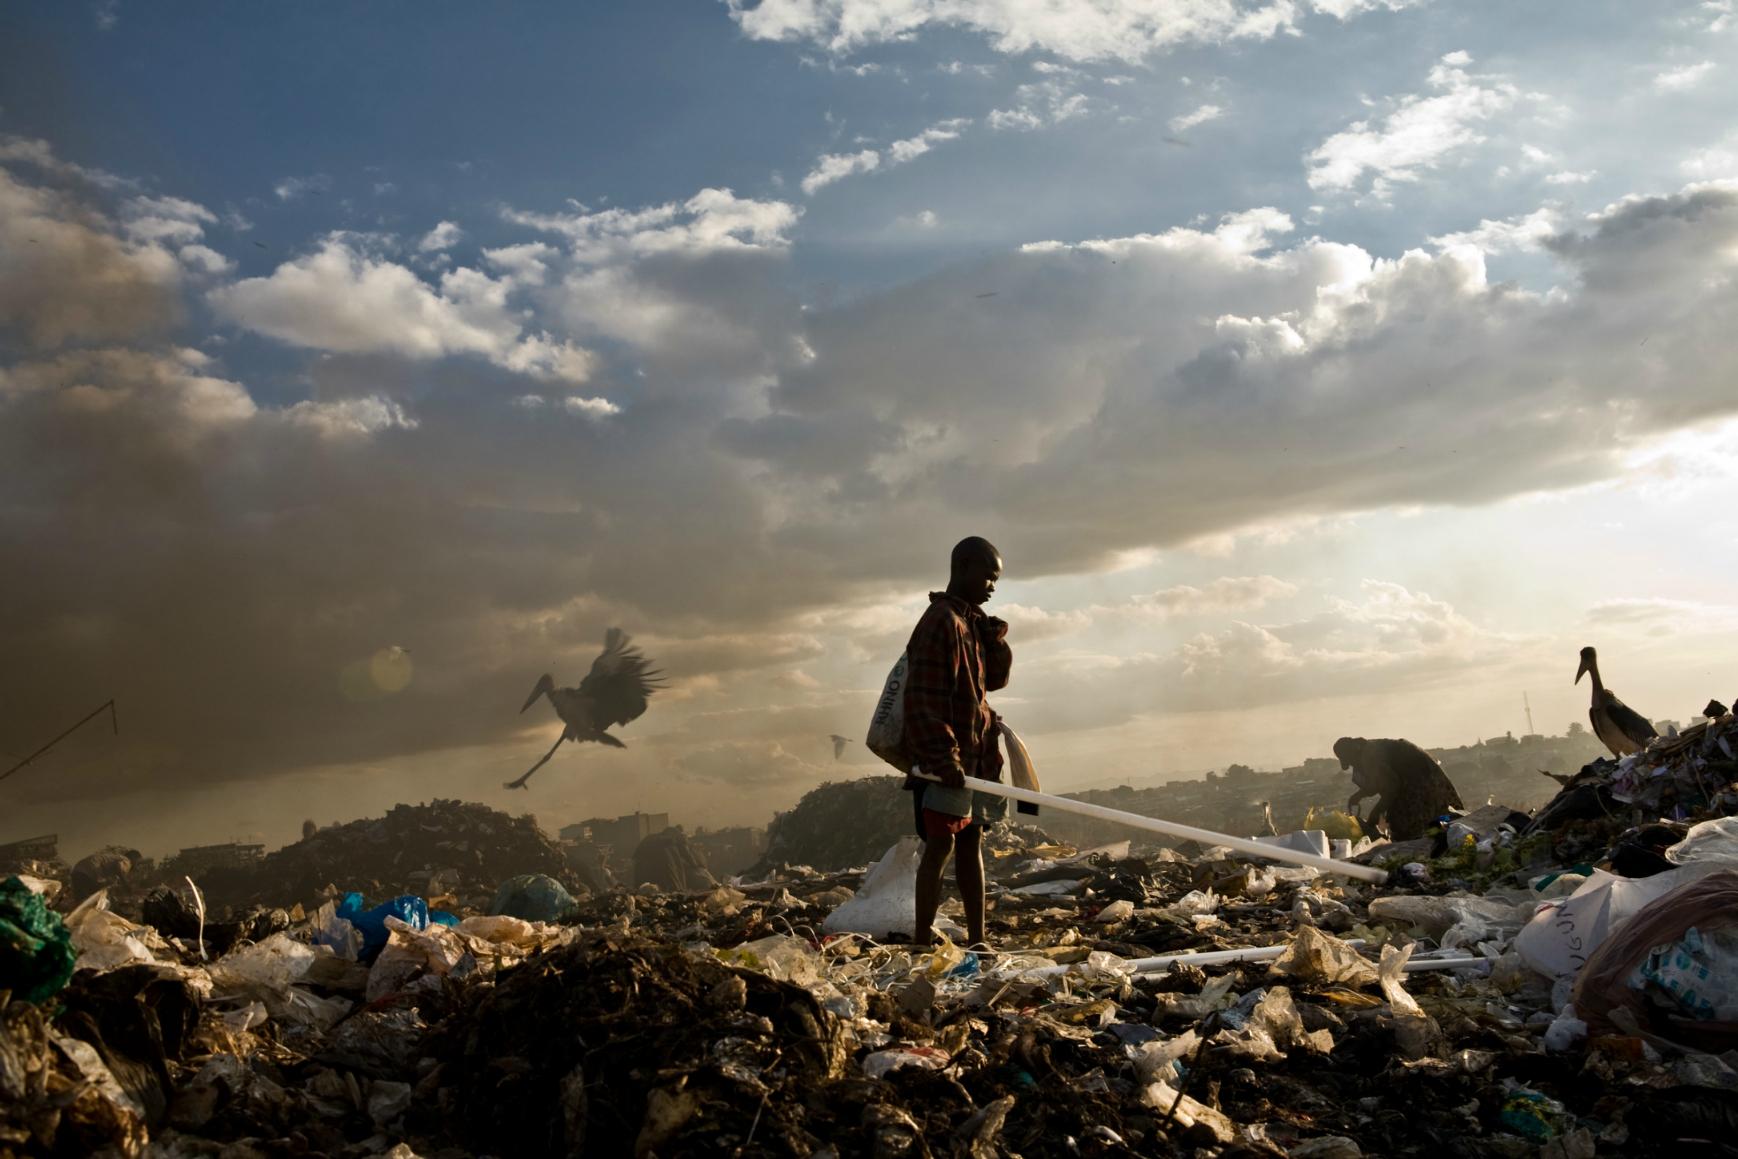 A young boy scavenging florescent light tubes in Kenya's Dandora dump site. Image:brendanbannon.com